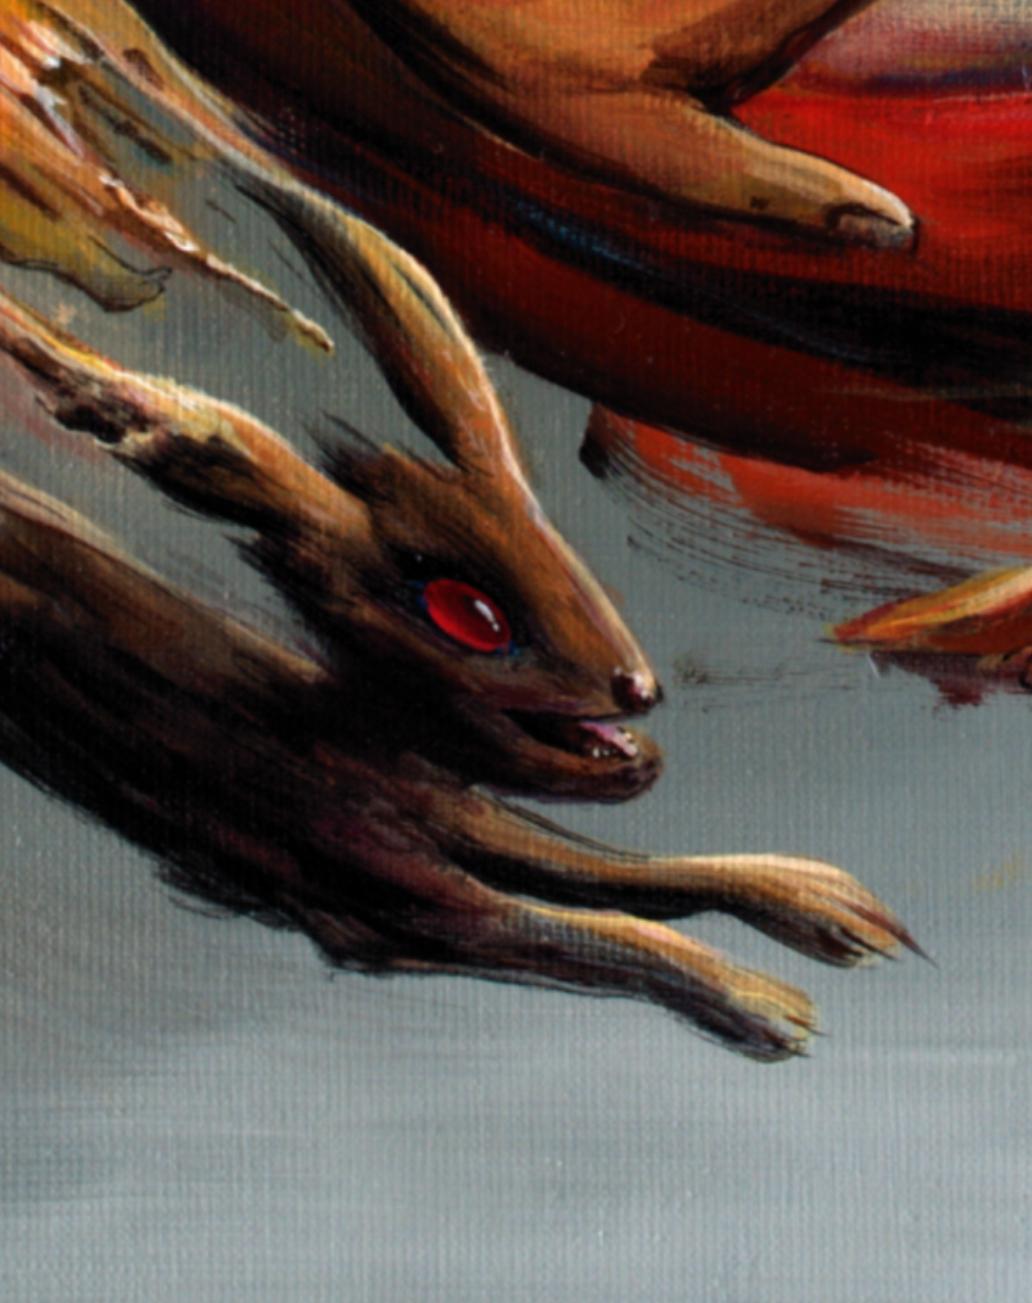 ART_paint_Horyzont_Zdarzen_03